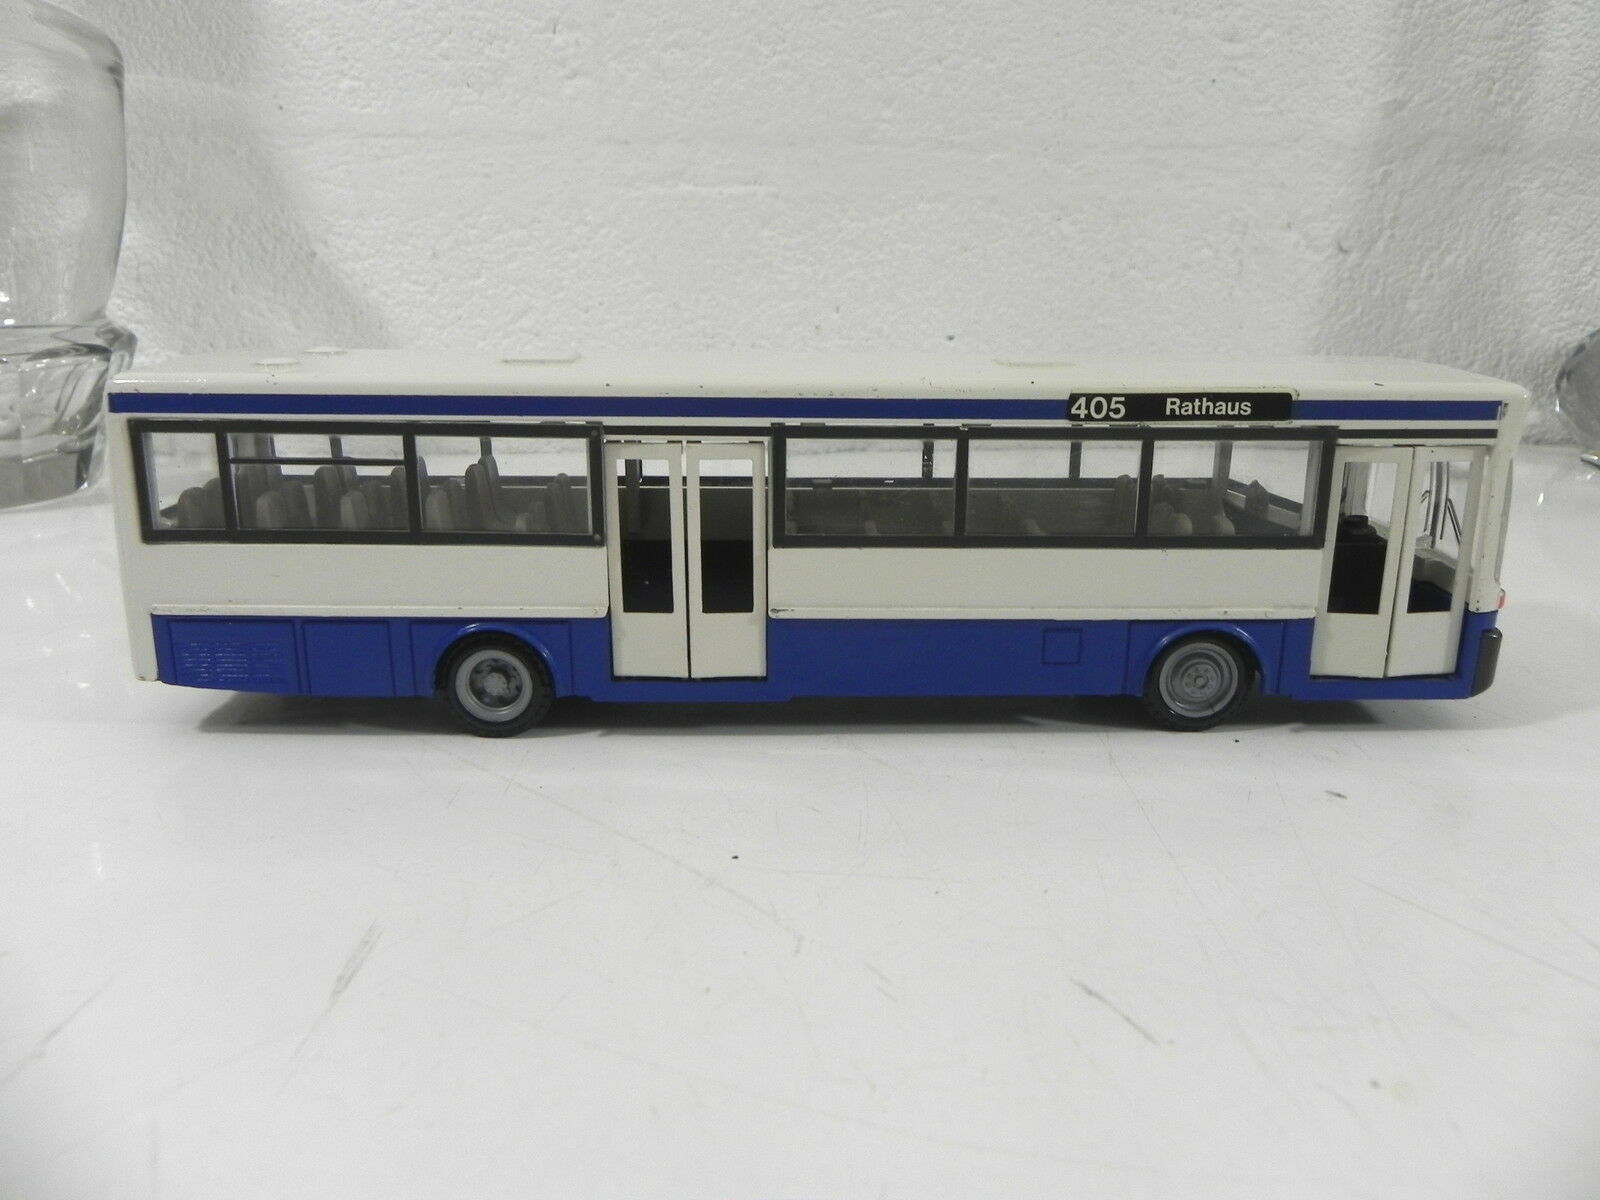 NZG MODELLE 1 50 N° 255 Autocar bus MERCEDES BENZ BENZ BENZ O 405 Rathaus 7e1977